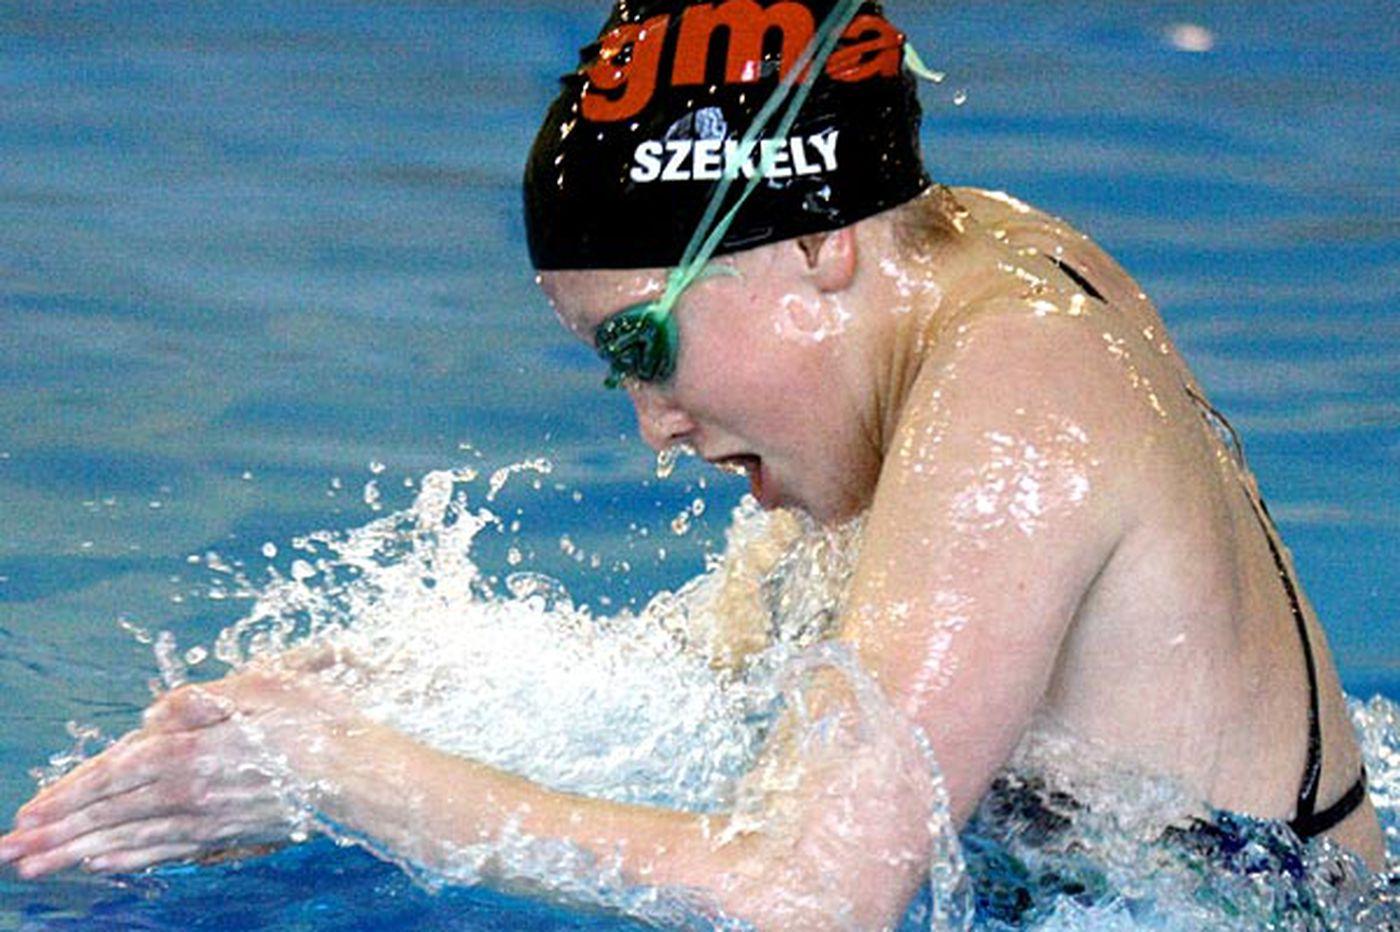 Archbishop Wood sweeps PIAA Class 2A District 12 swimming championships; La Salle, Ryan girls take 3A crowns